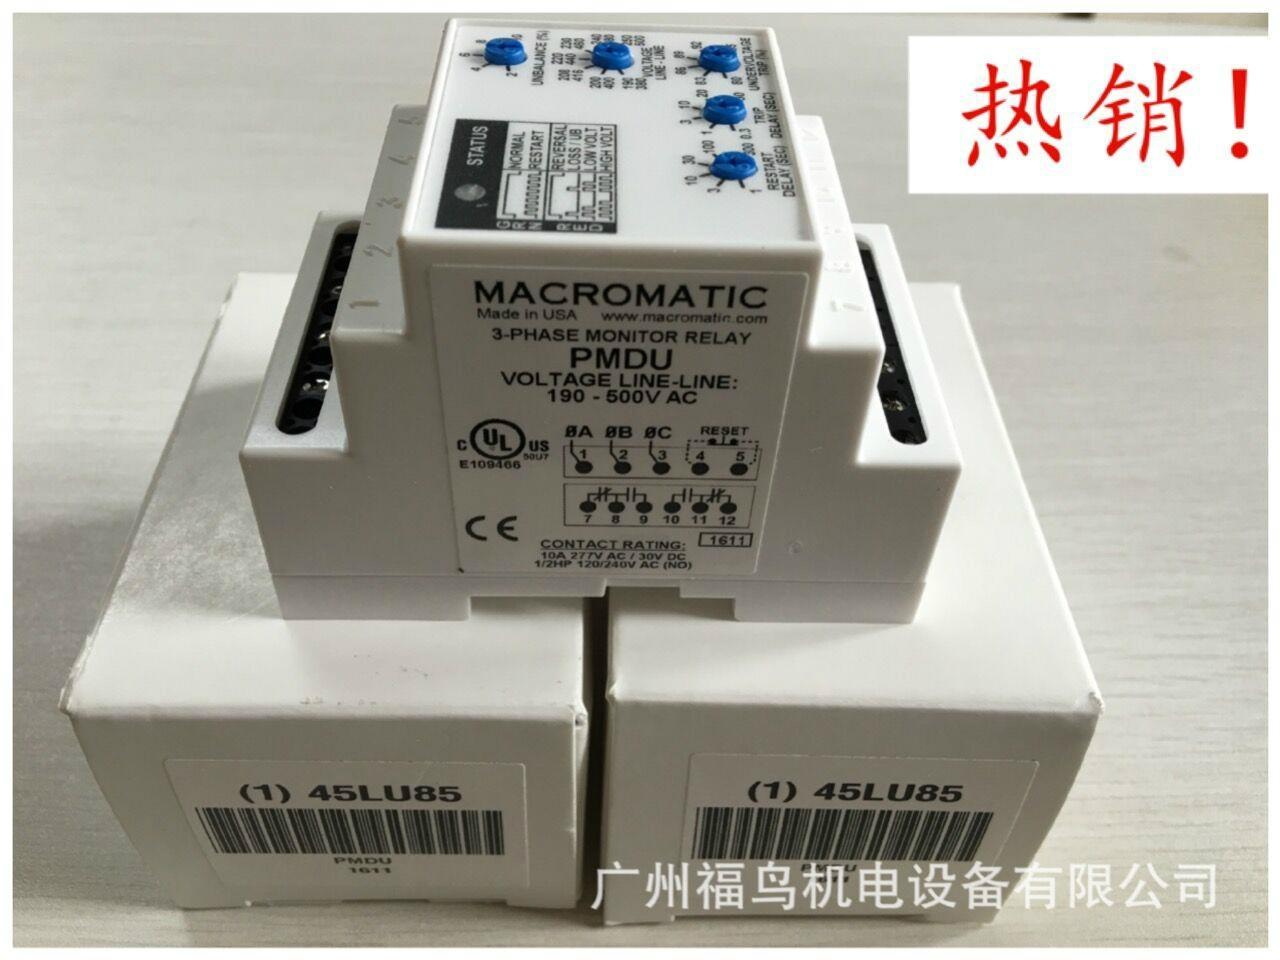 MACROMATIC继电器, 型号:PMDU